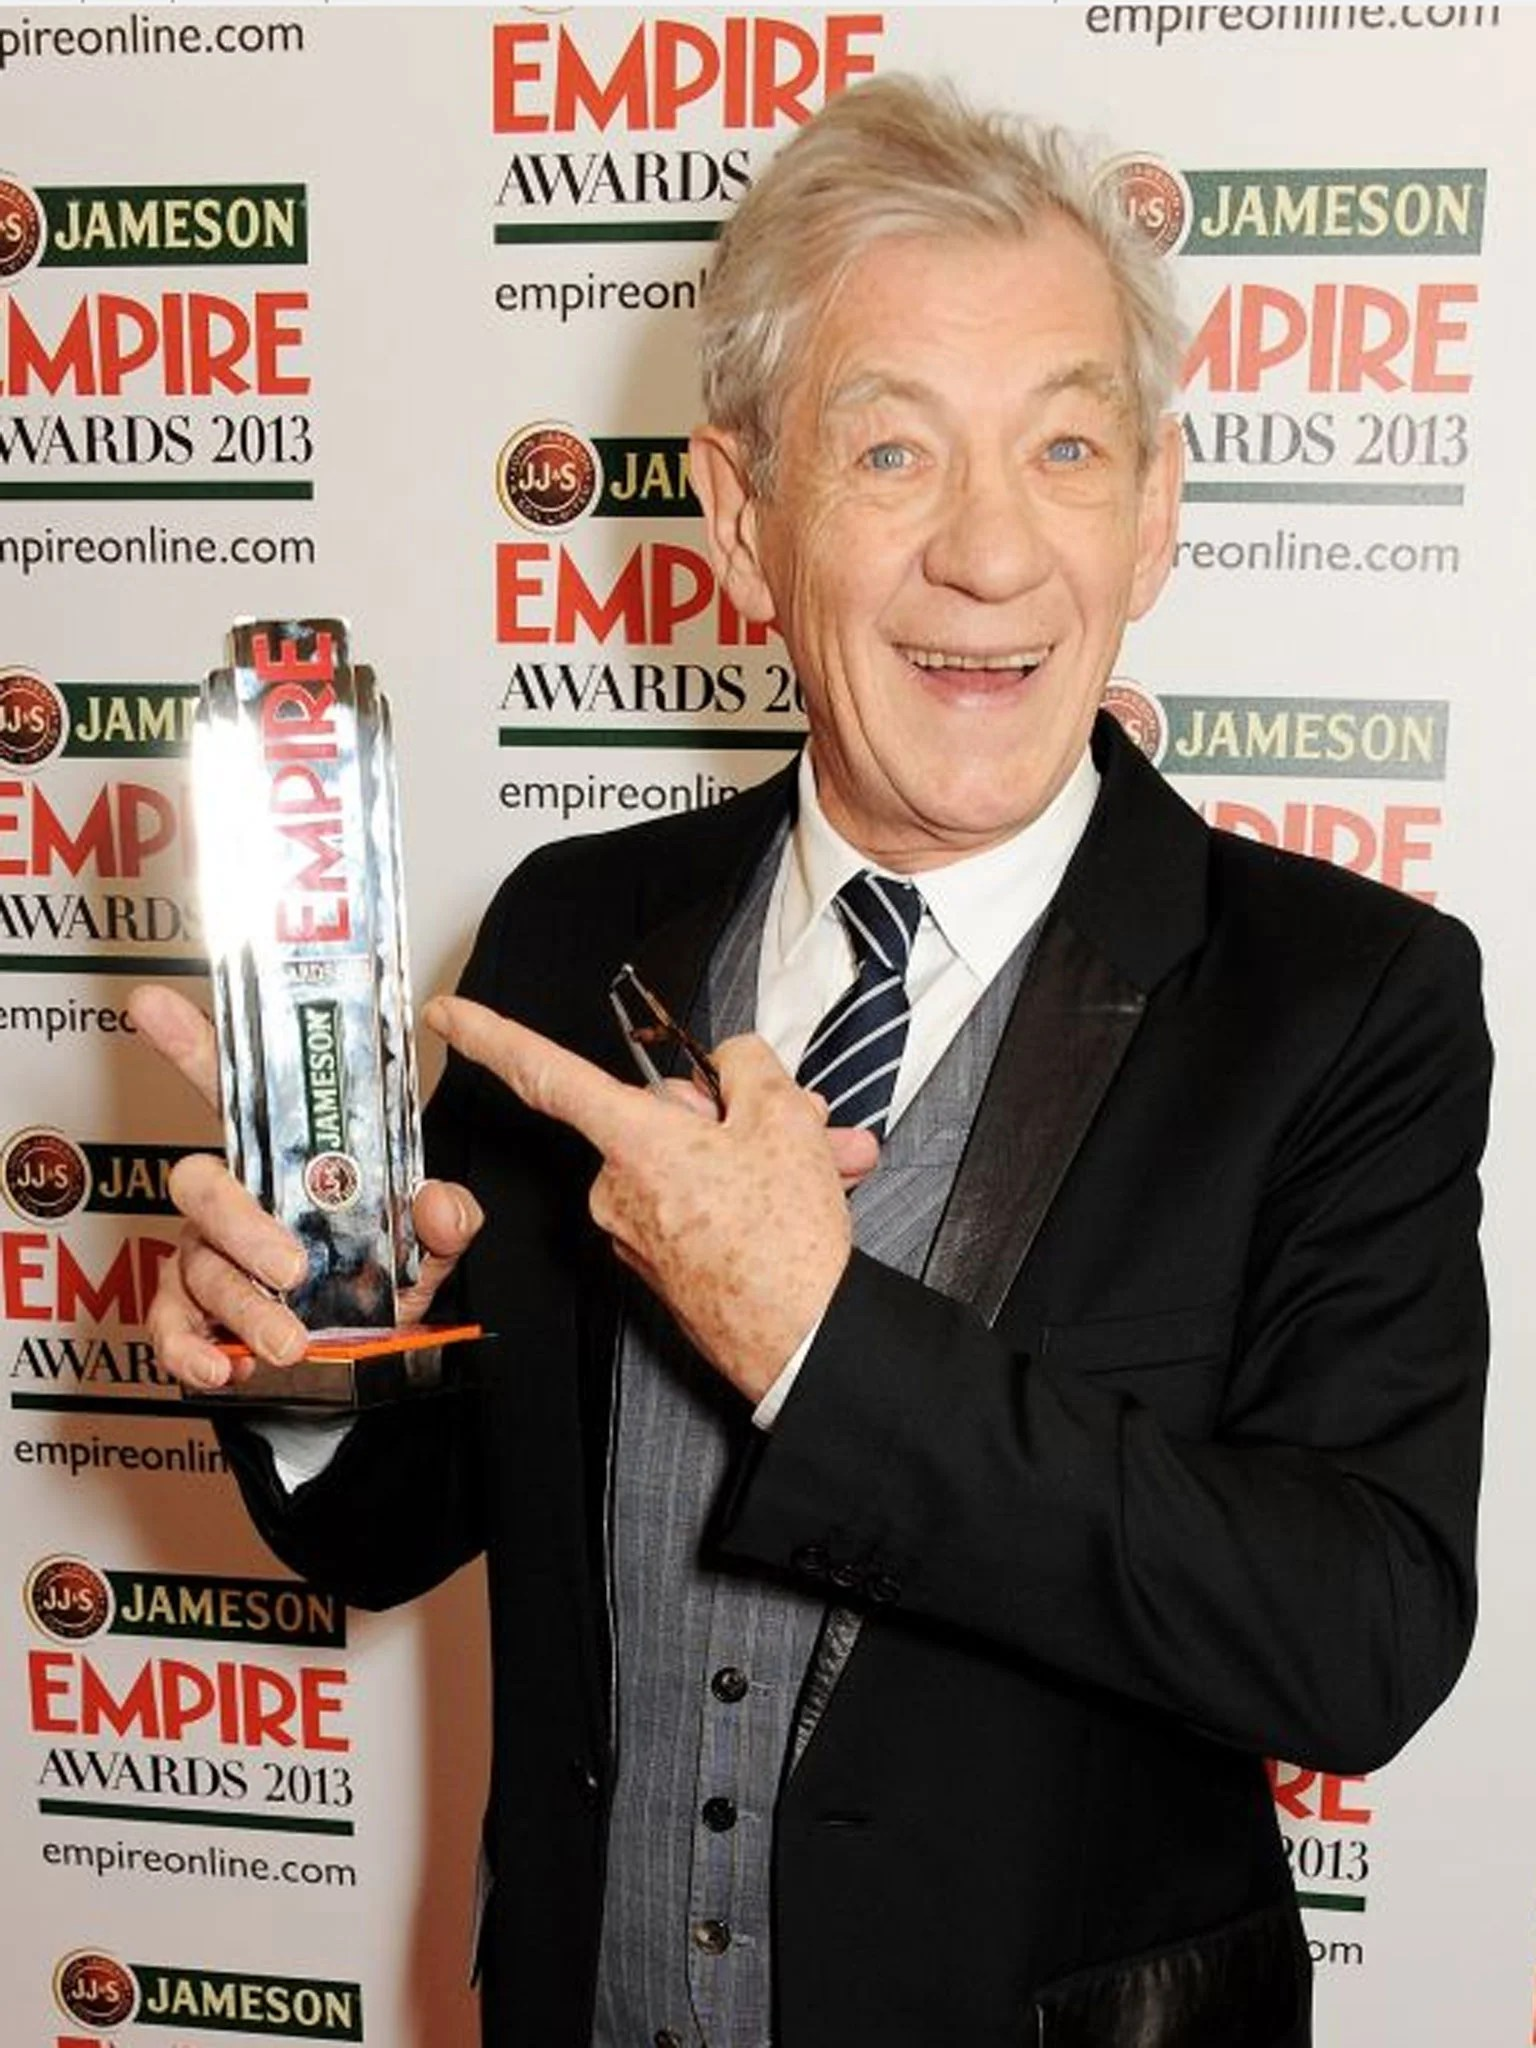 Jameson Empire Film Awards: Martin Freeman wins best actor ...